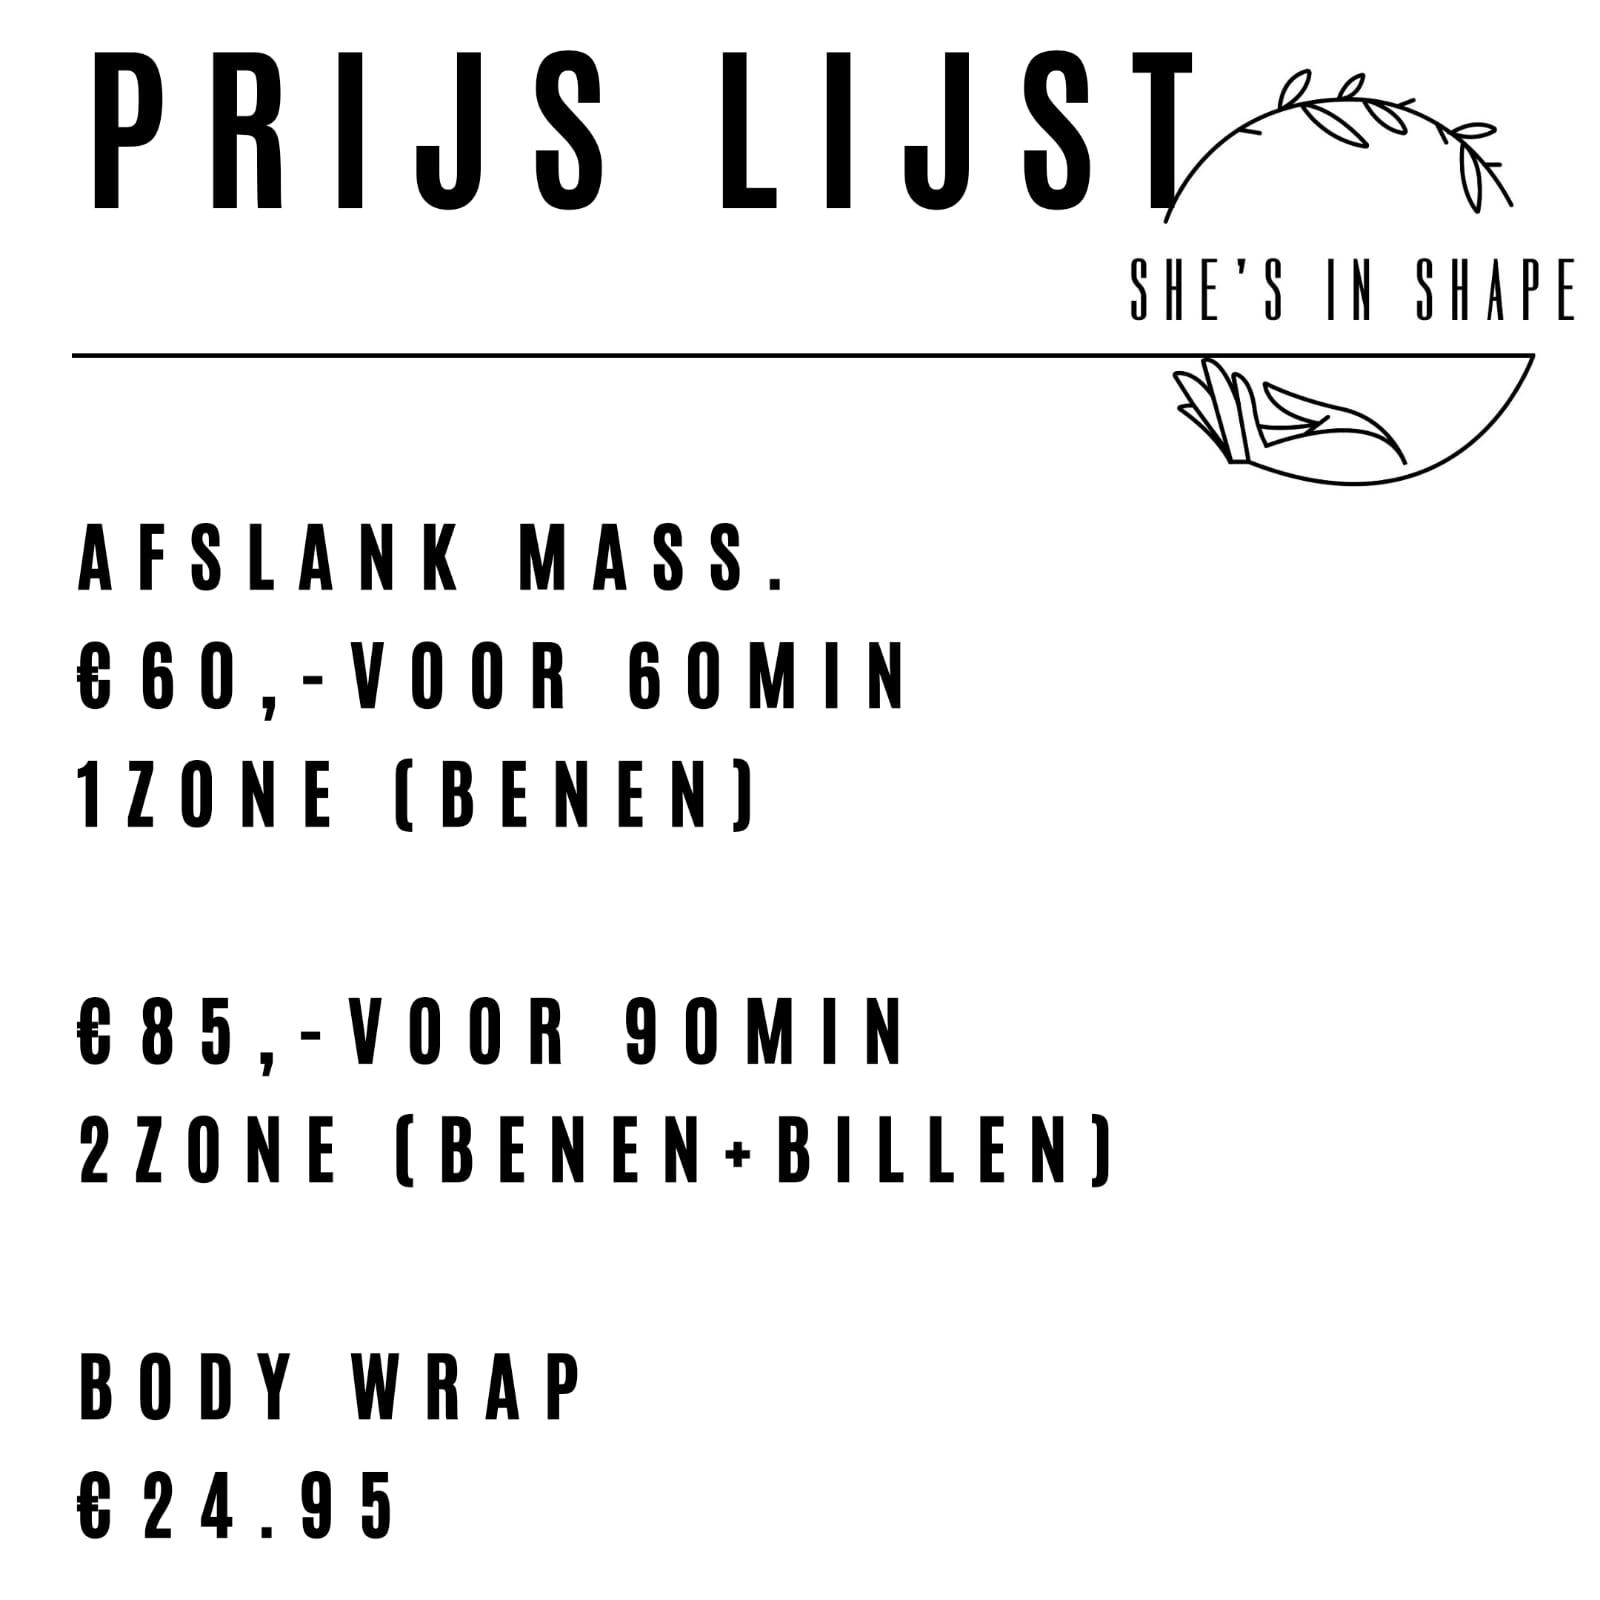 Prijslijst Shesinshape.nl